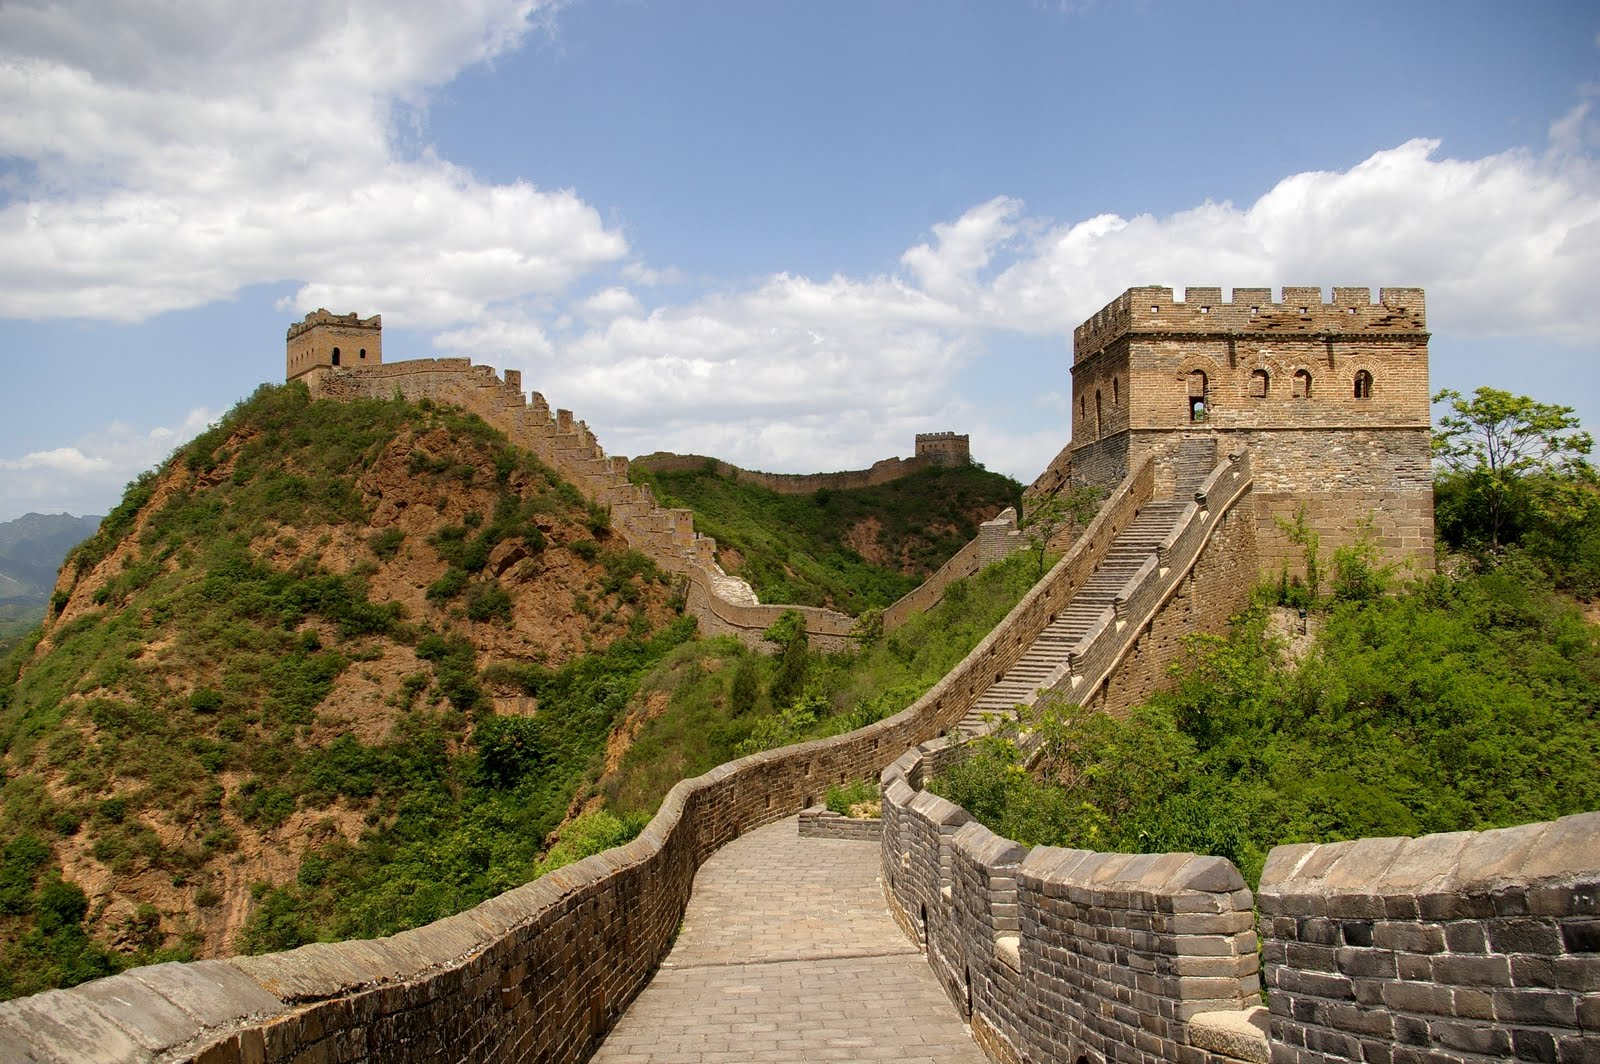 Imagenes de la muralla china imagui for Q es la muralla china